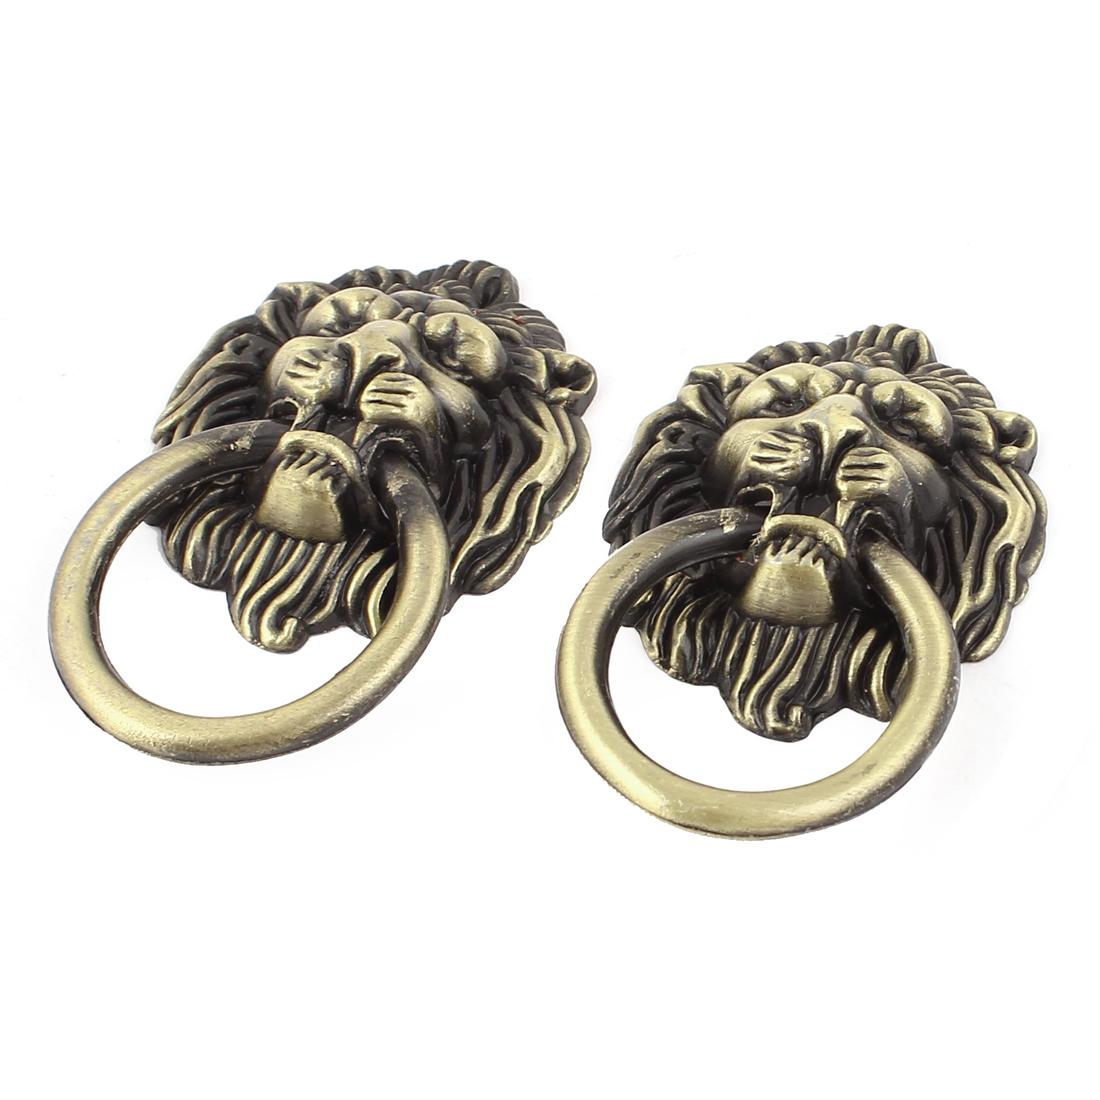 Antique Style Lion Head Design Drawer Ring Pull Handle Knob 2pcs